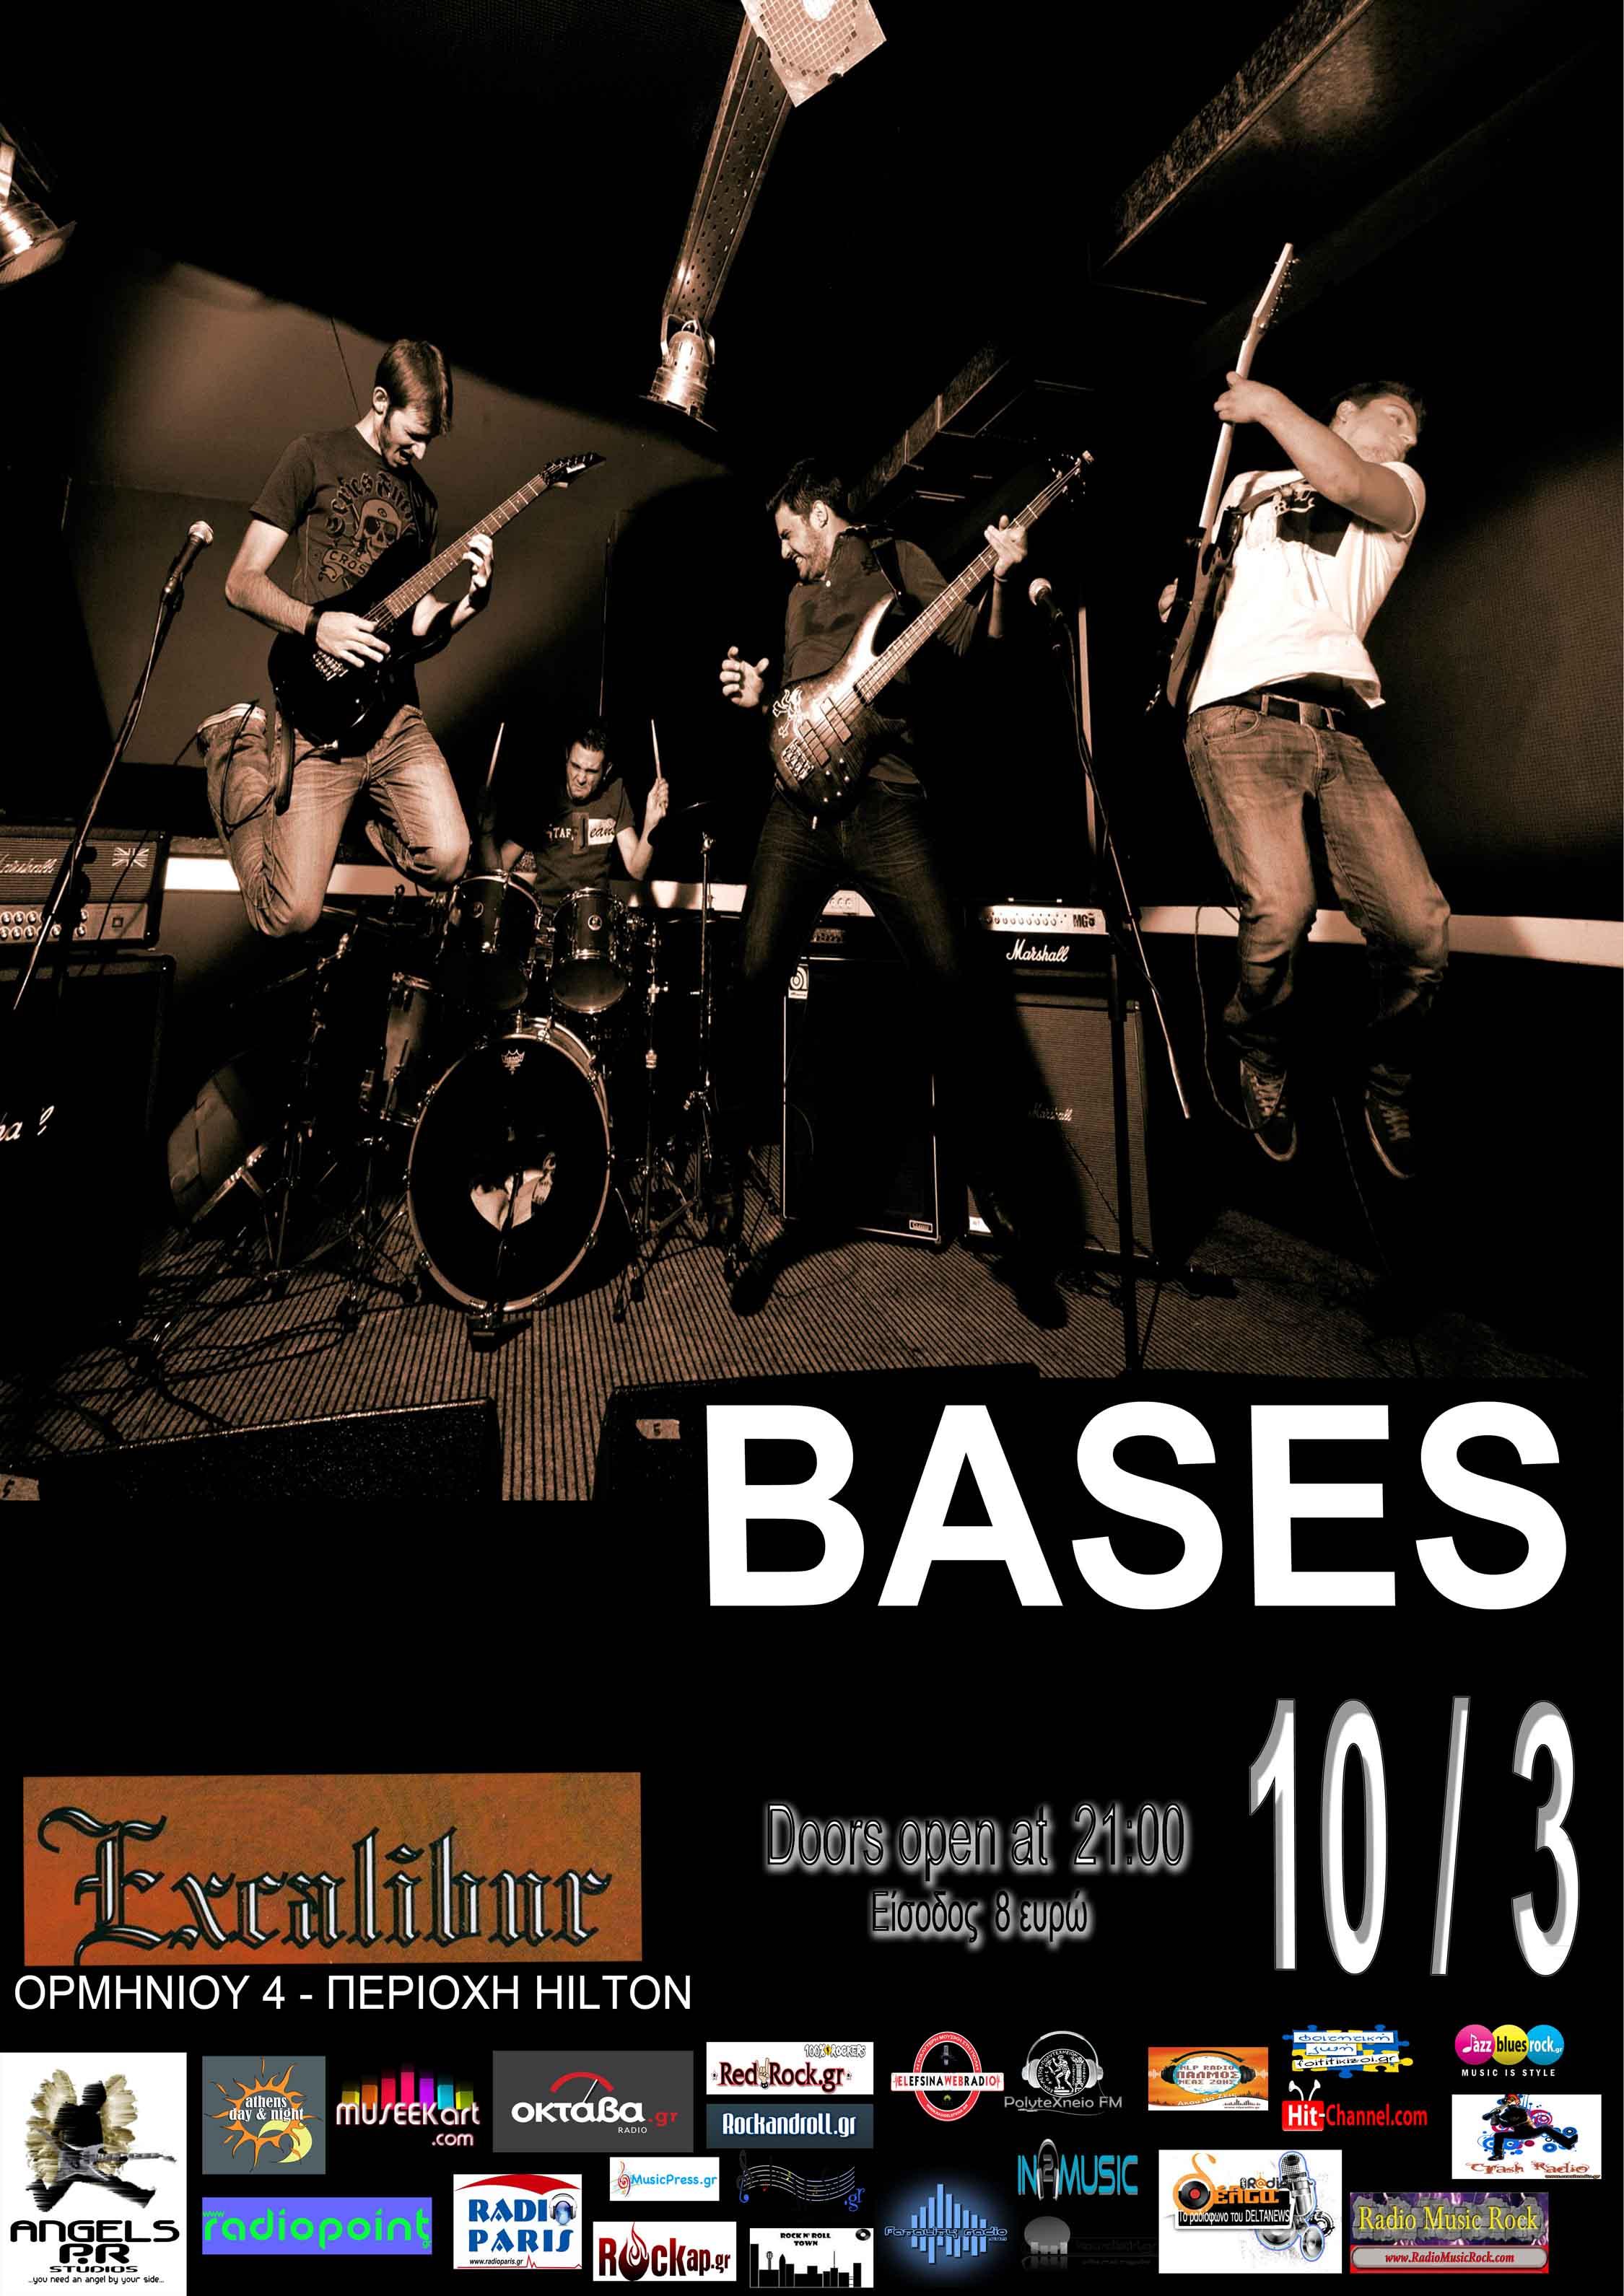 BASES LIVE @ EXCALIBUR Κυριακή 10 Μαρτίου 2013